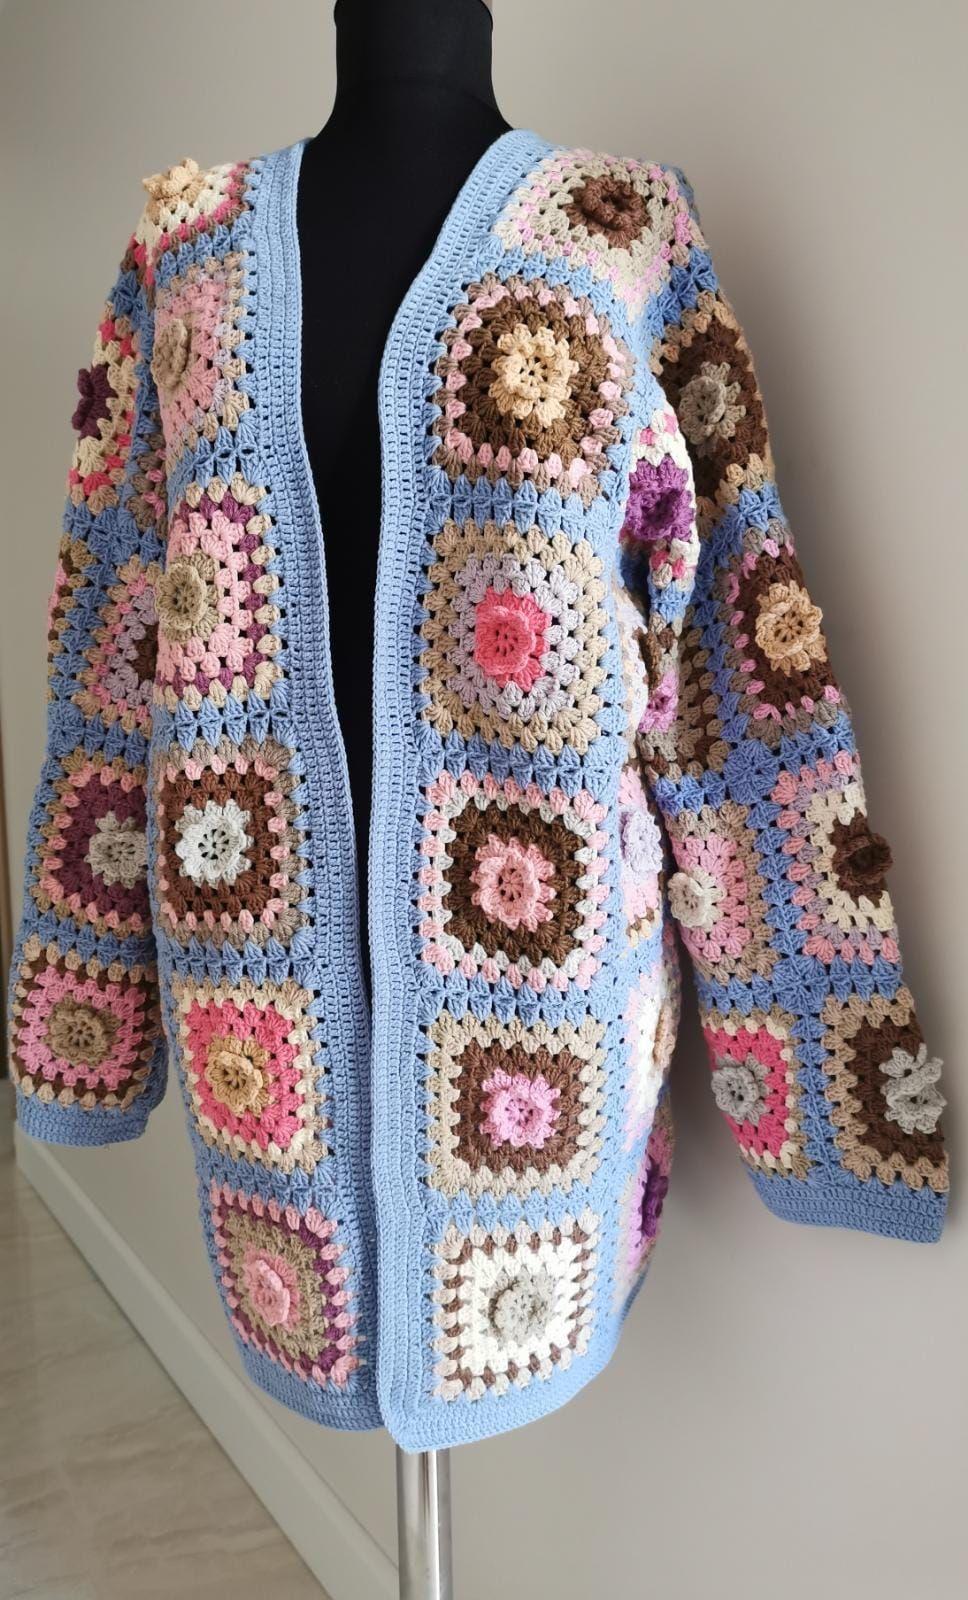 Granny Square Yarn Cardigan,Special Design Granny Square Premium Acrylic Cardigan,Handmade Patchwork Jacket,Handmade Yarn Coat